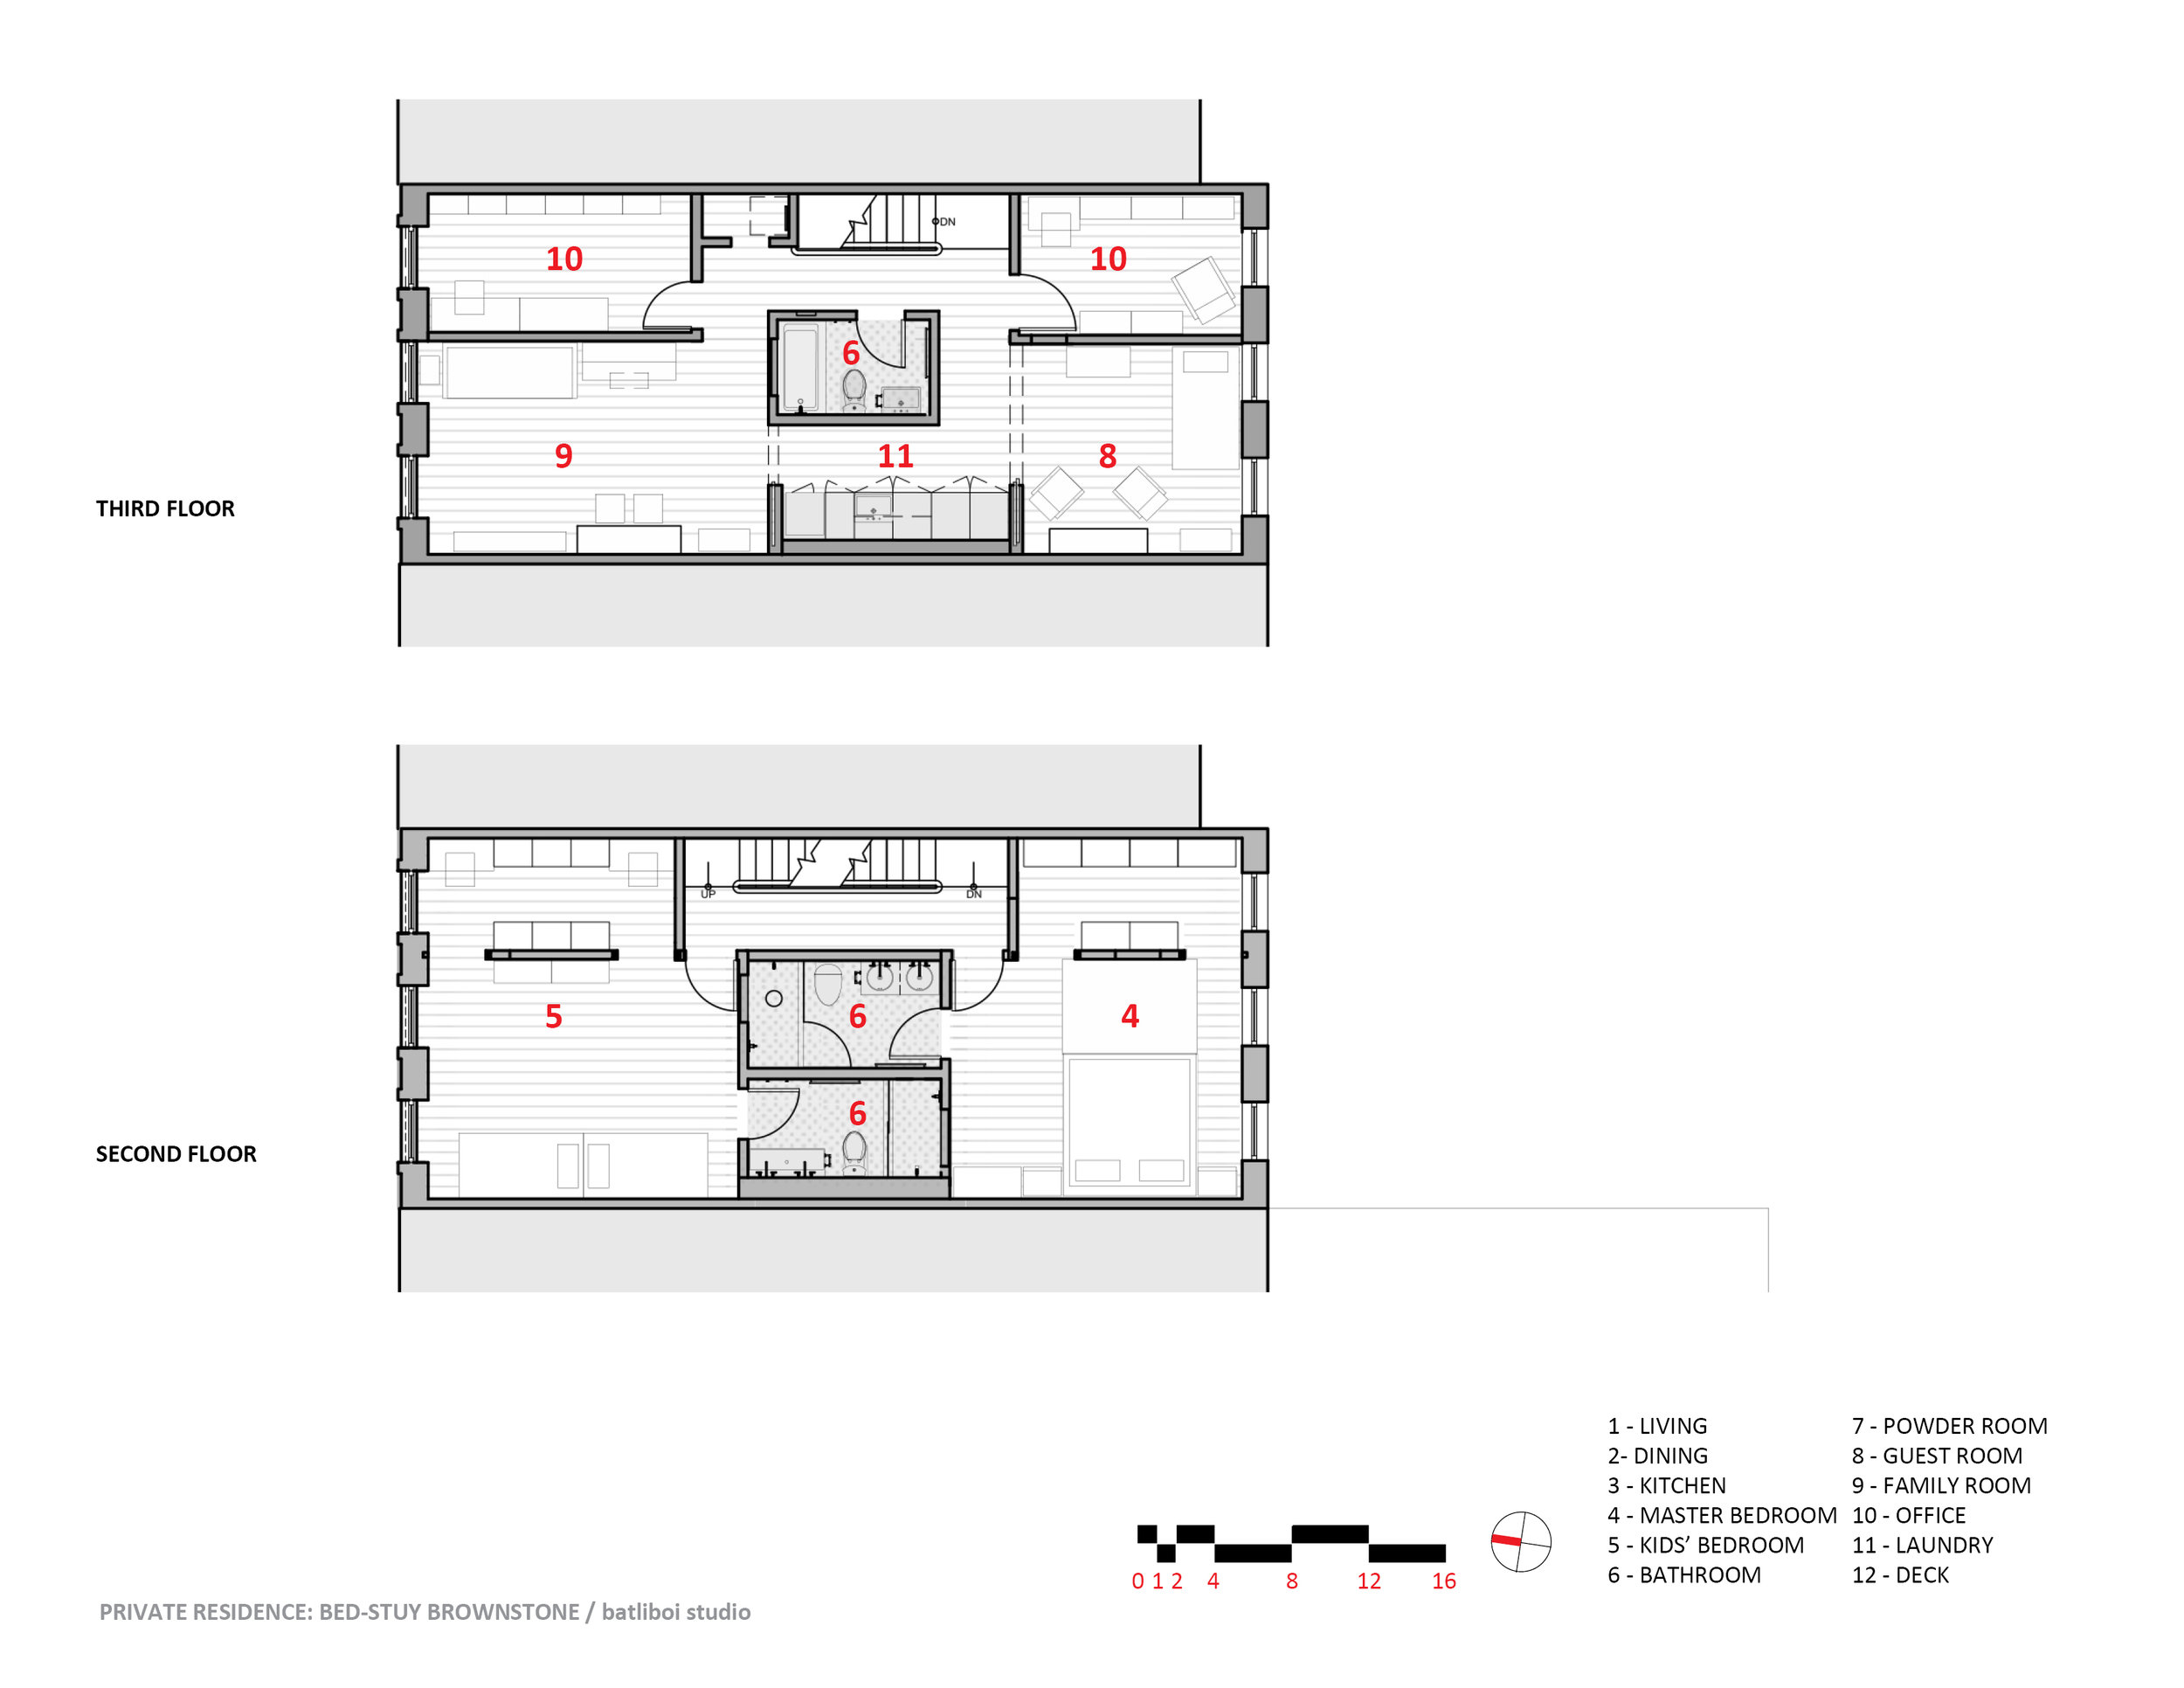 Bed-Stuy townhouse - plans 6.jpg